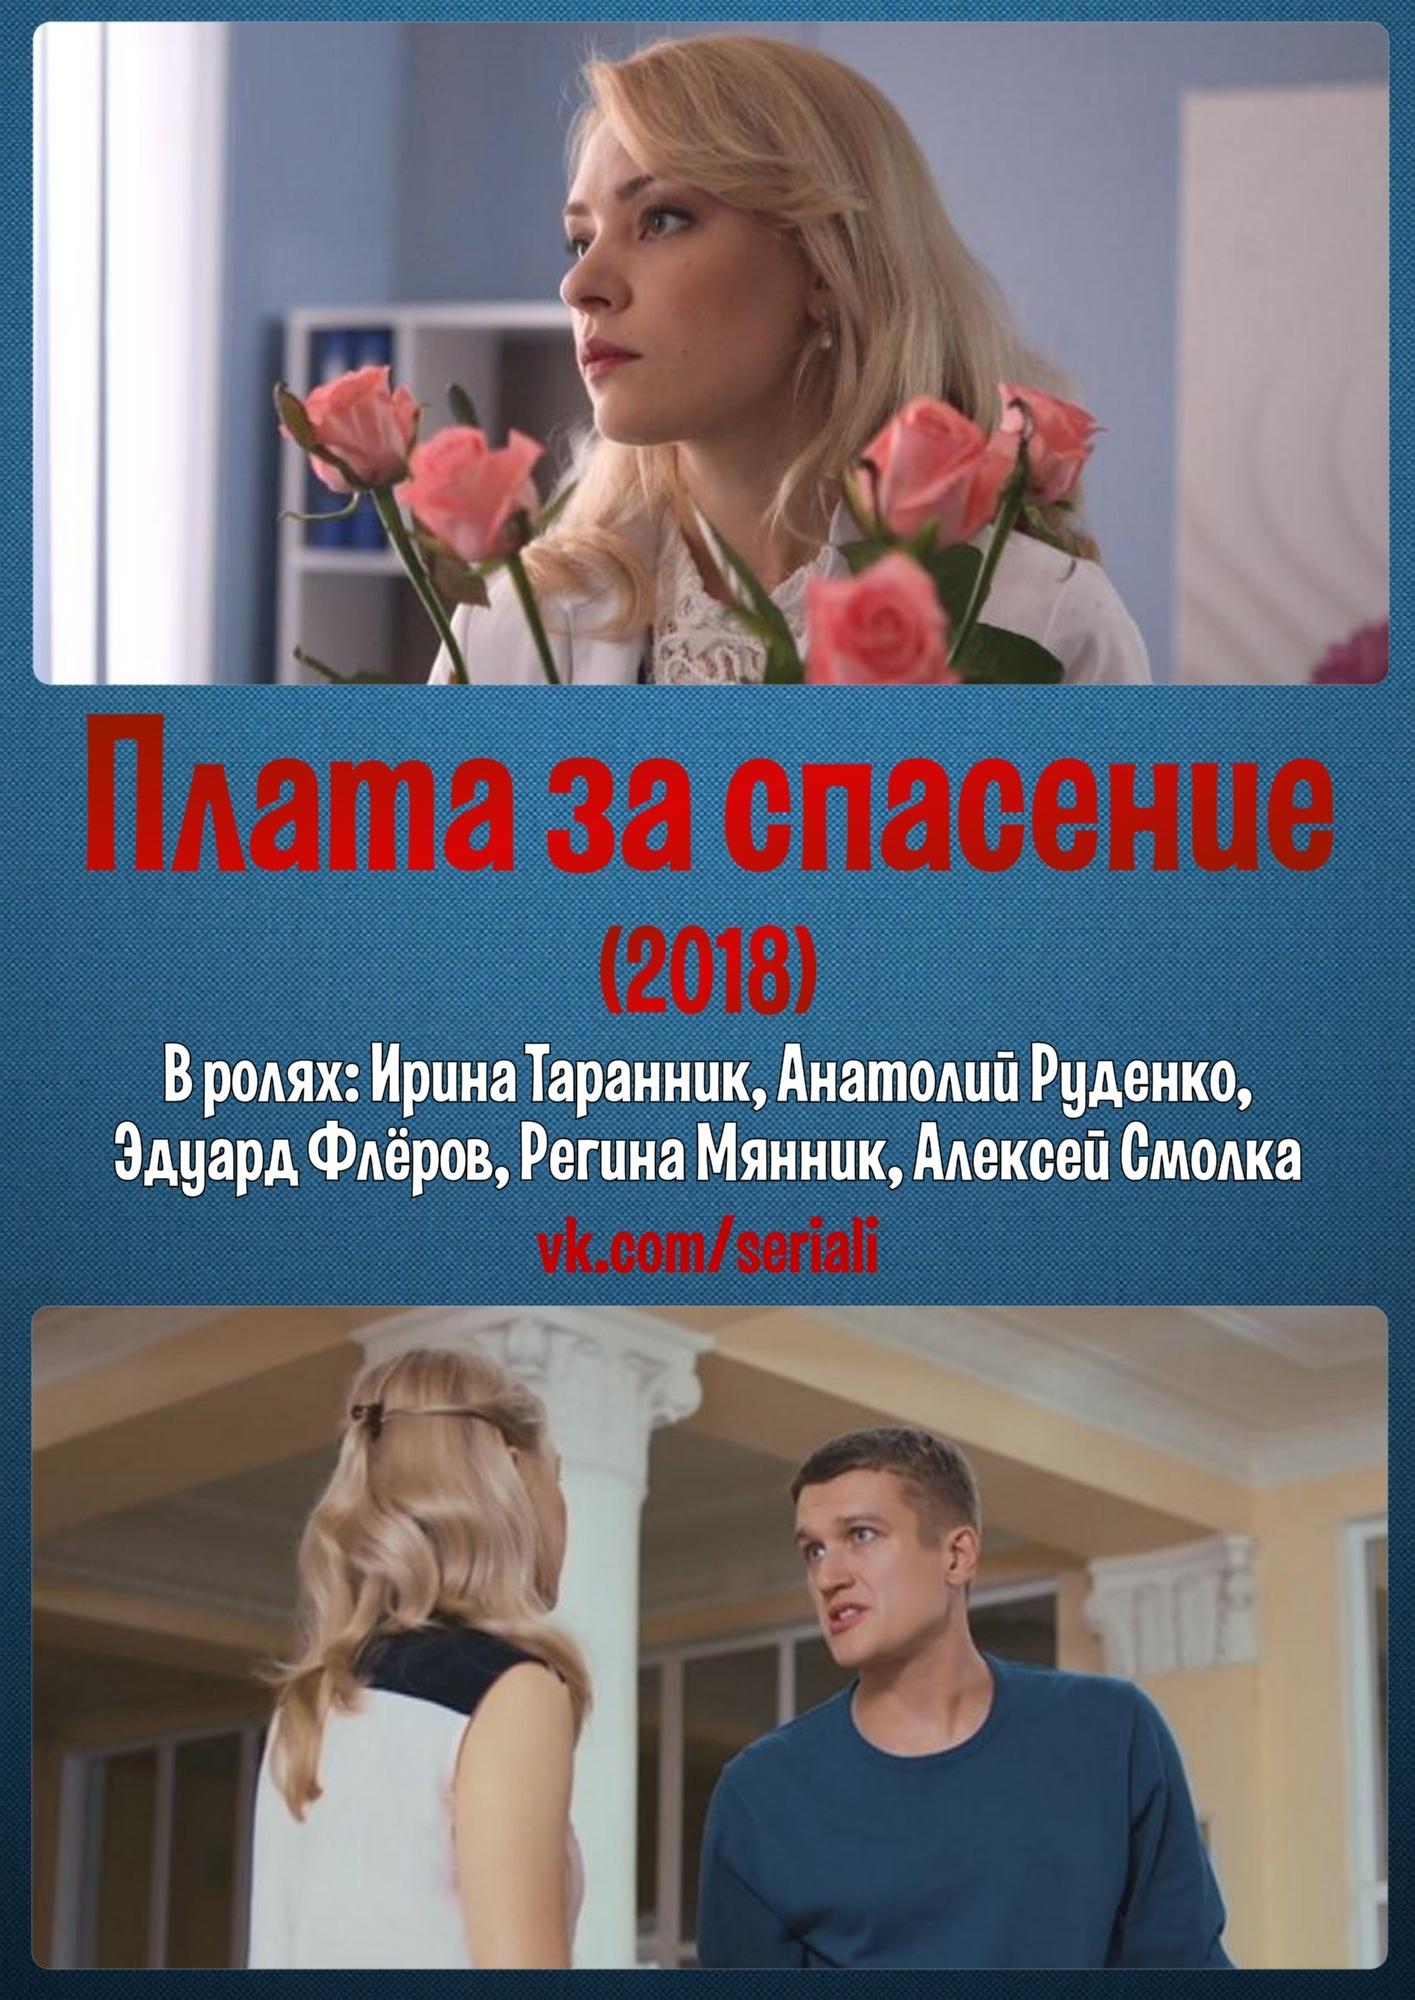 Мелодрама «Плaтa зa cпaceниe / Бoль чyжoй пoтepи» (2018) 1-4 серия из 4 HD